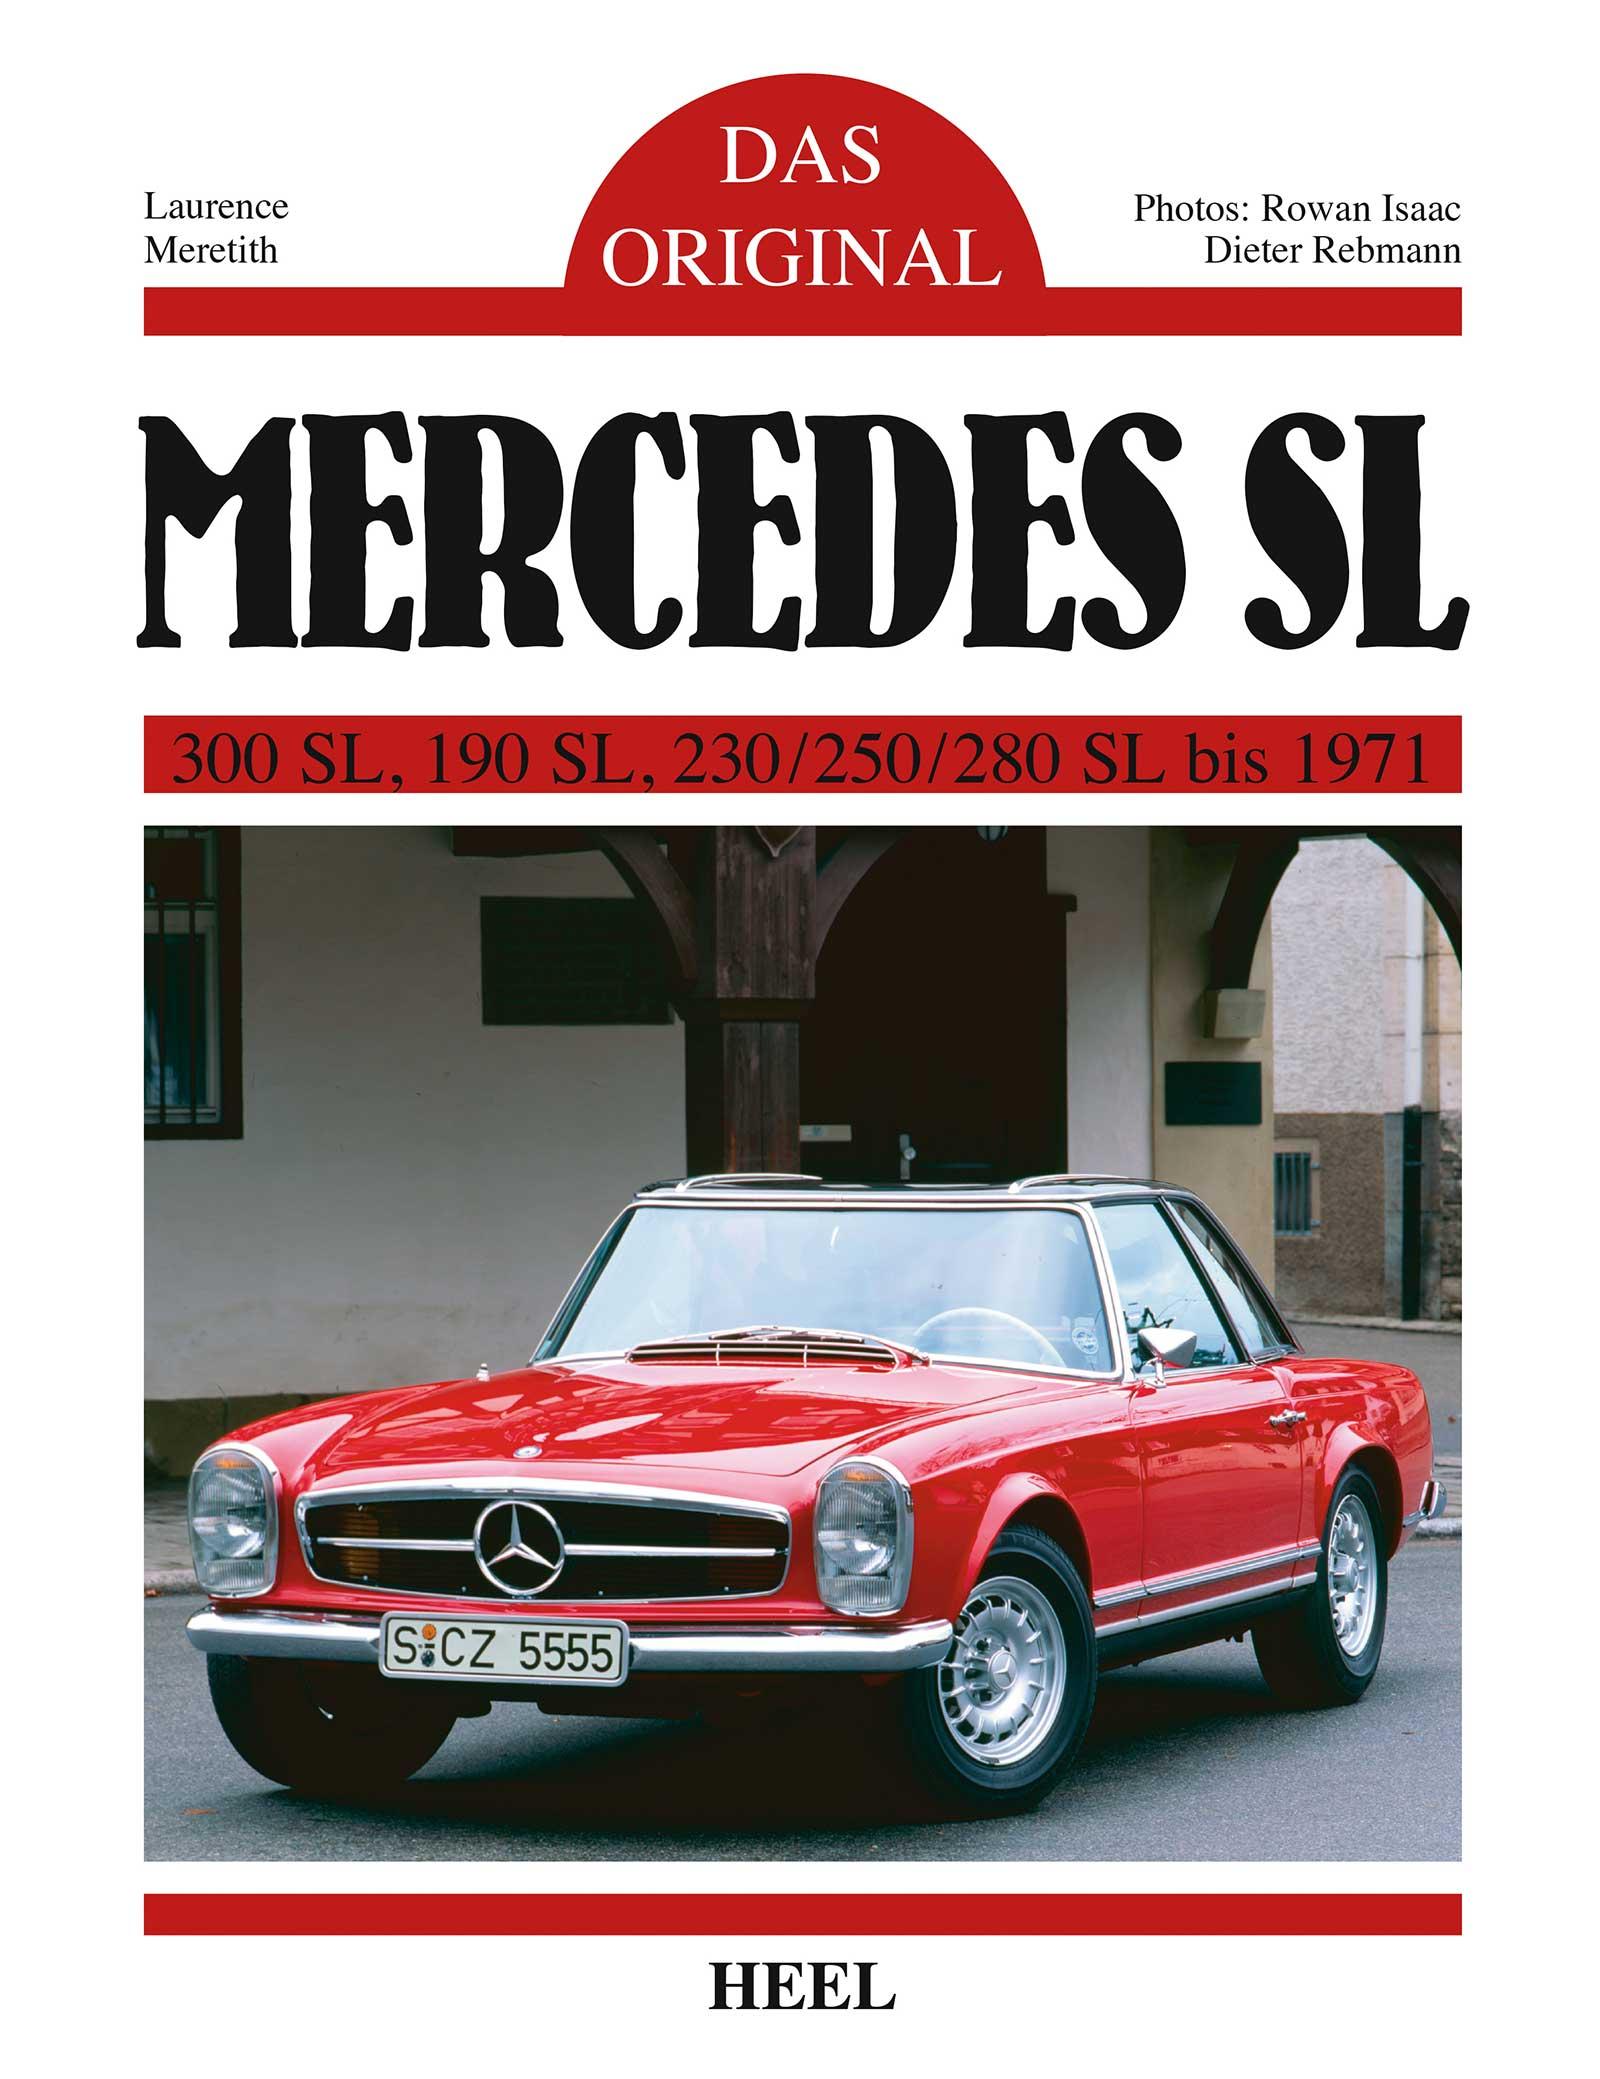 Das Original: Mercedes SL, Laurence Meredith